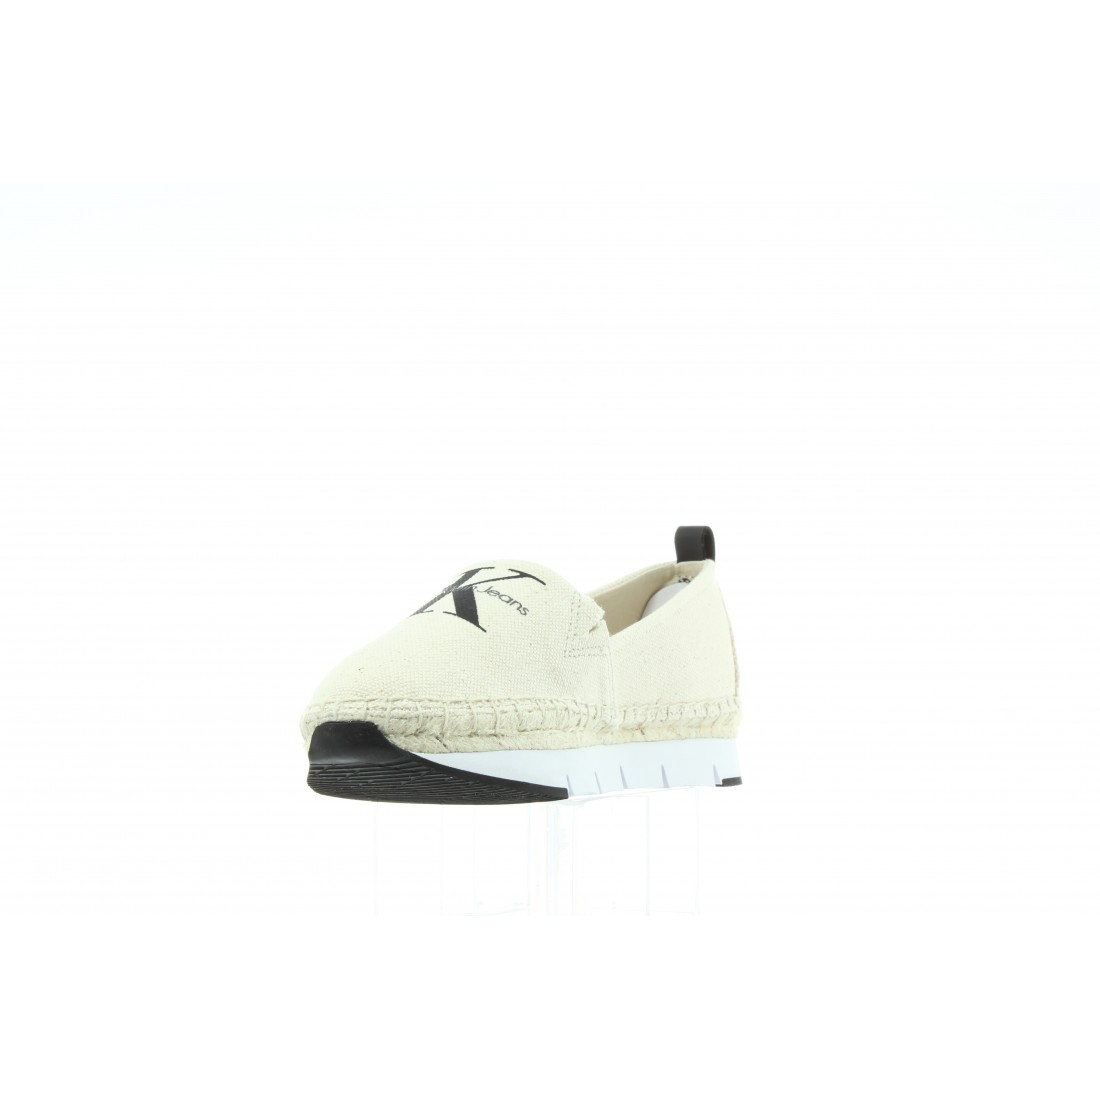 R8949 Natural White Biały